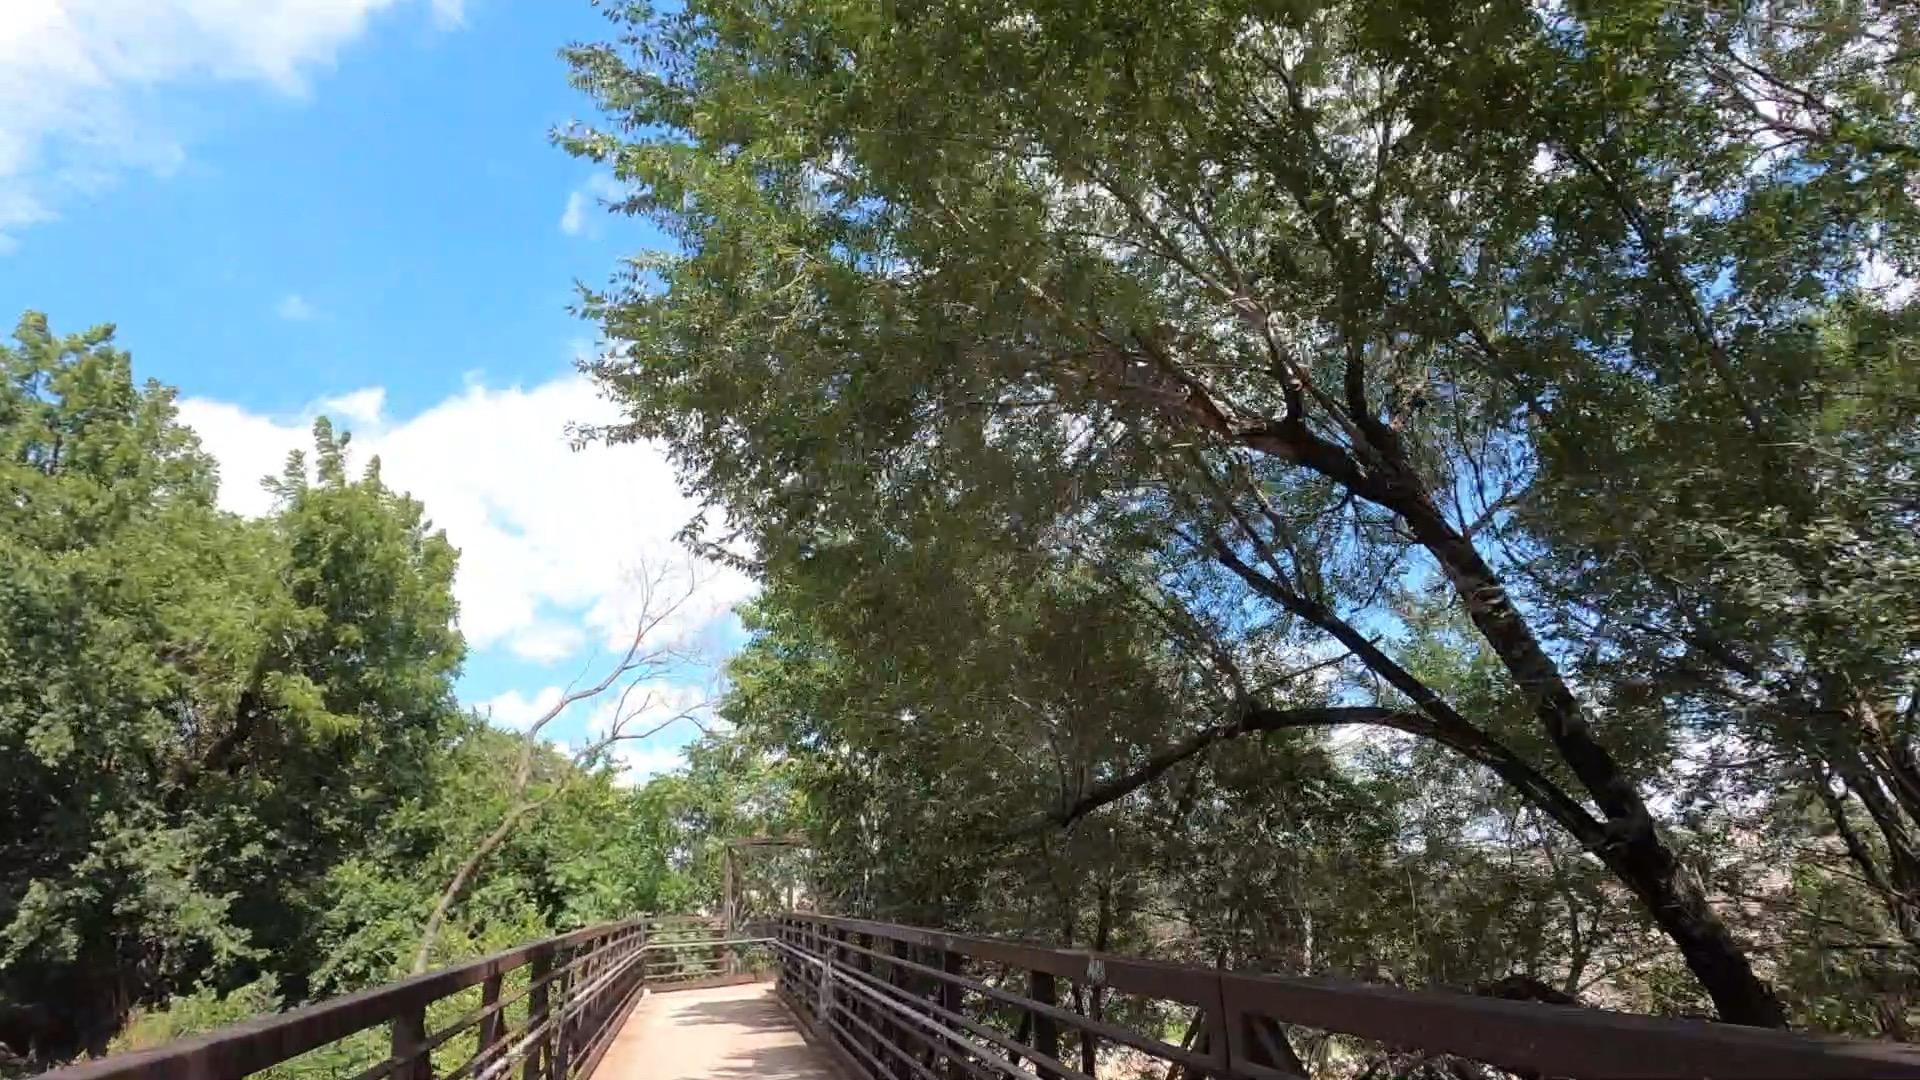 newblock bridge